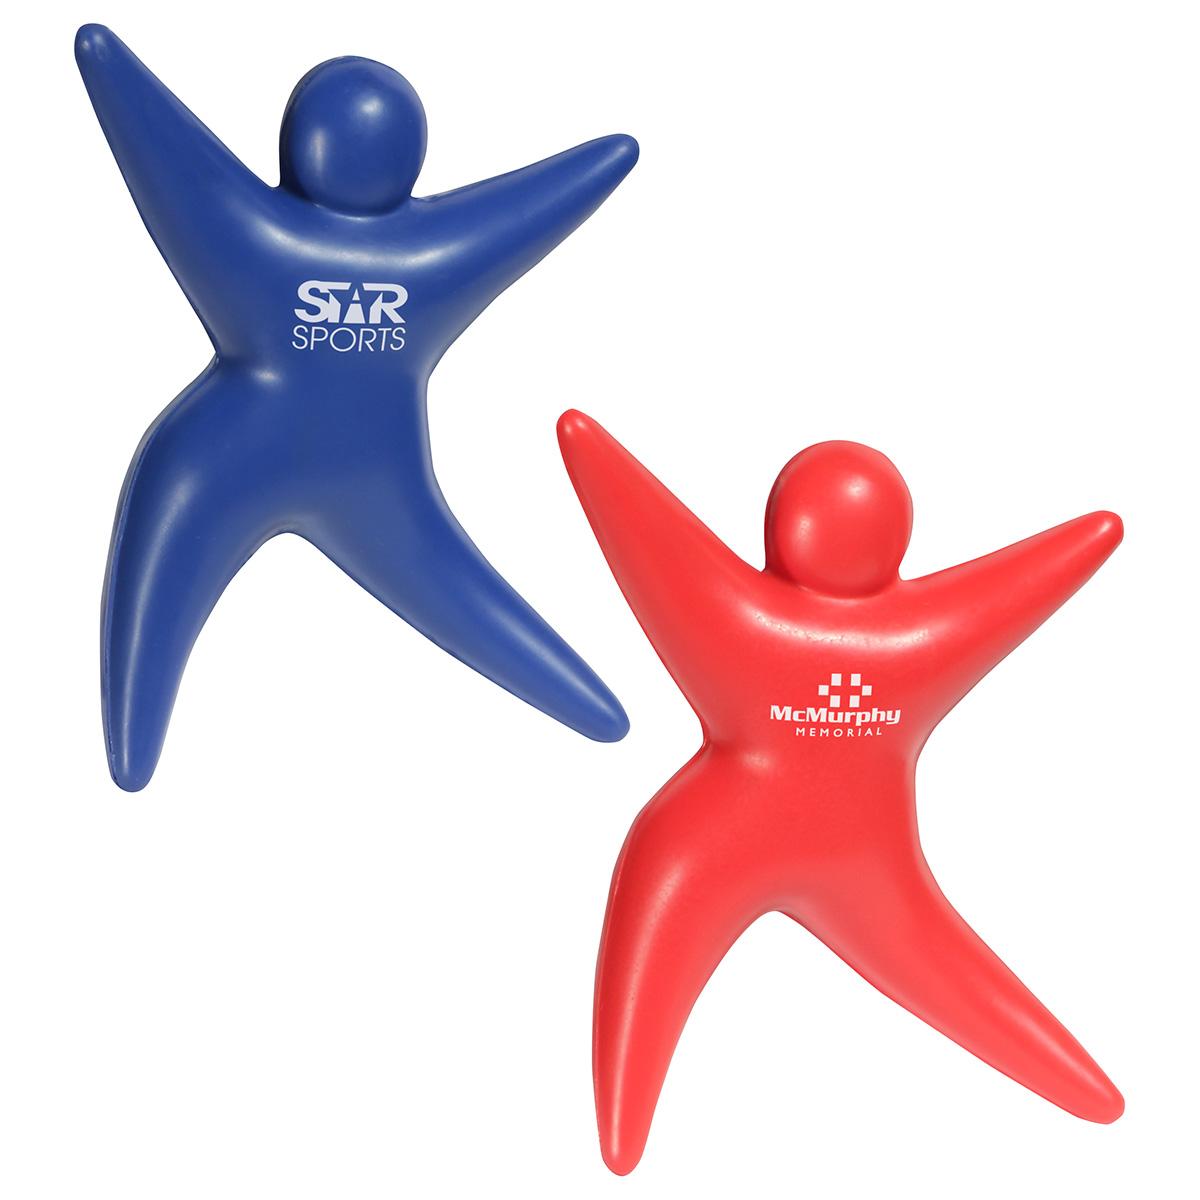 Starman Stress Reliever, LGS-SM17 - 1 Colour Imprint